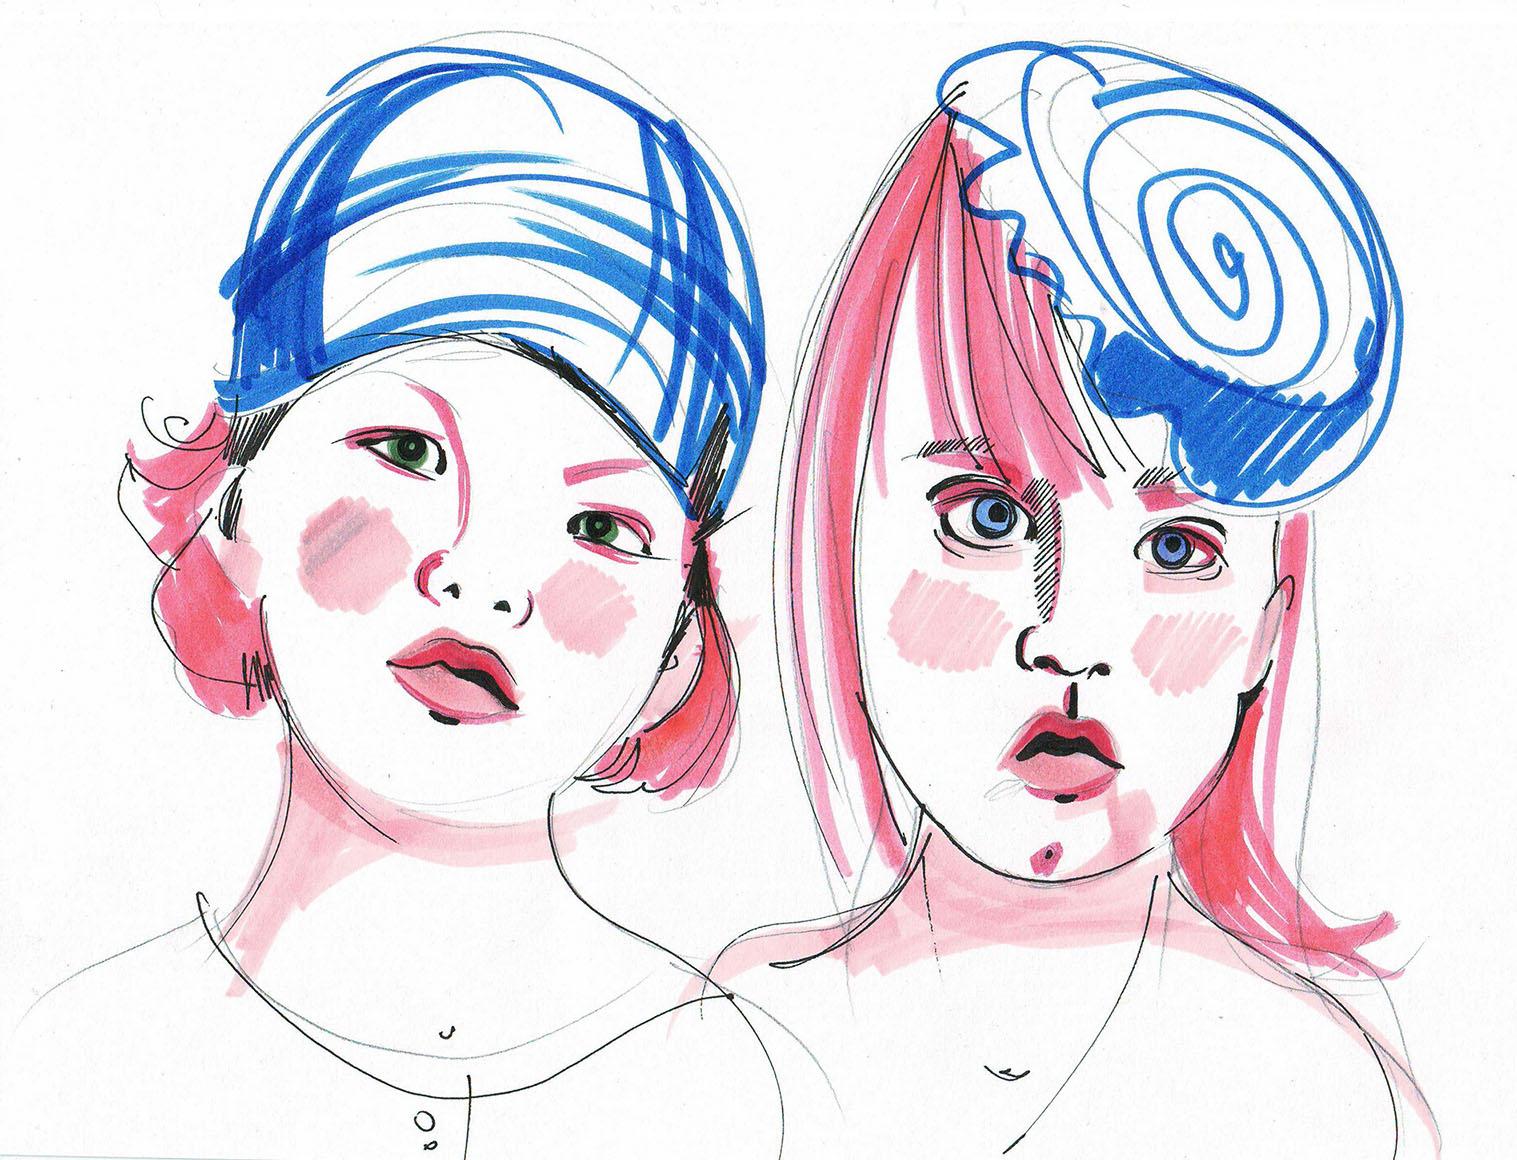 Polina_Shubkina_Illustration_Portraiture-008.jpg